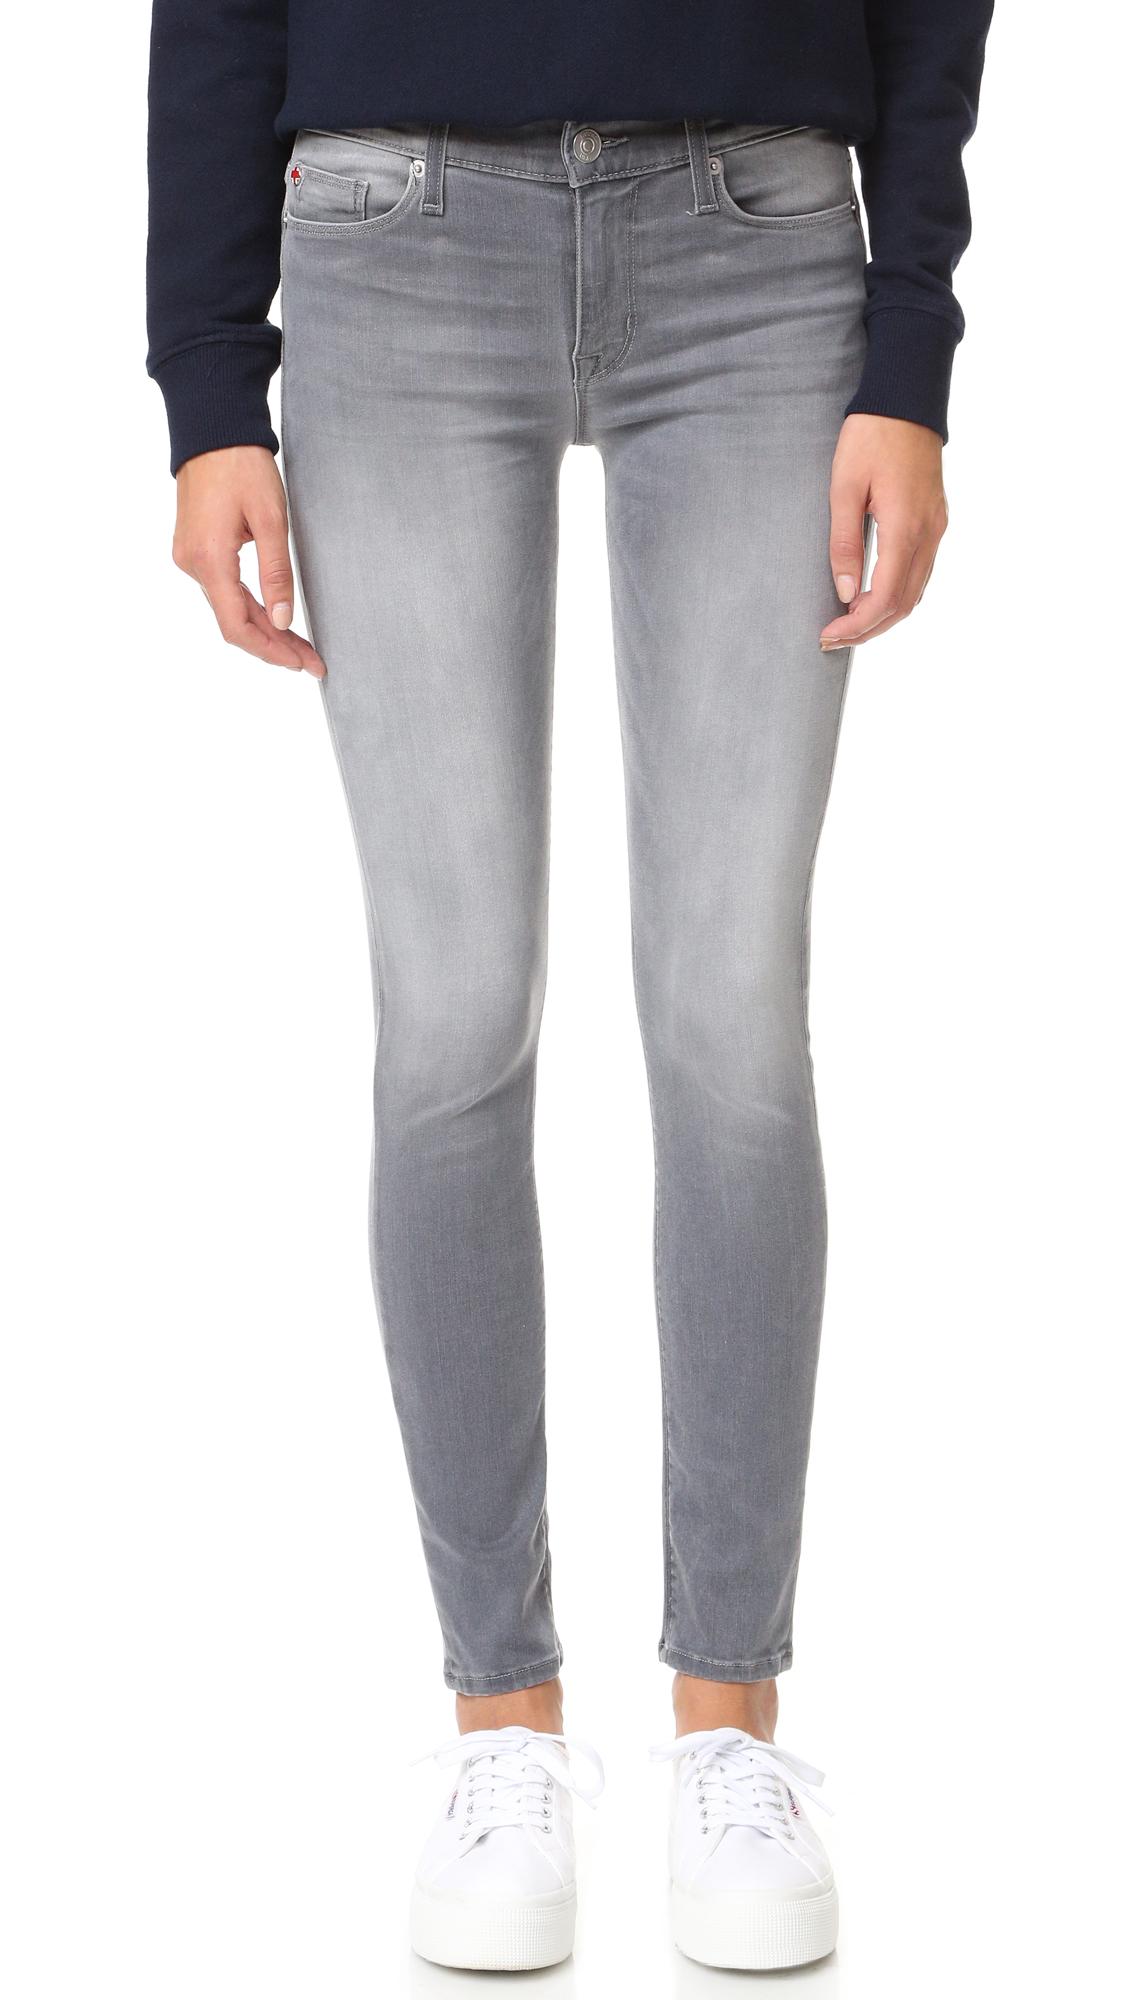 Hudson Nico Super Skinny Jeans - Spark Plug at Shopbop